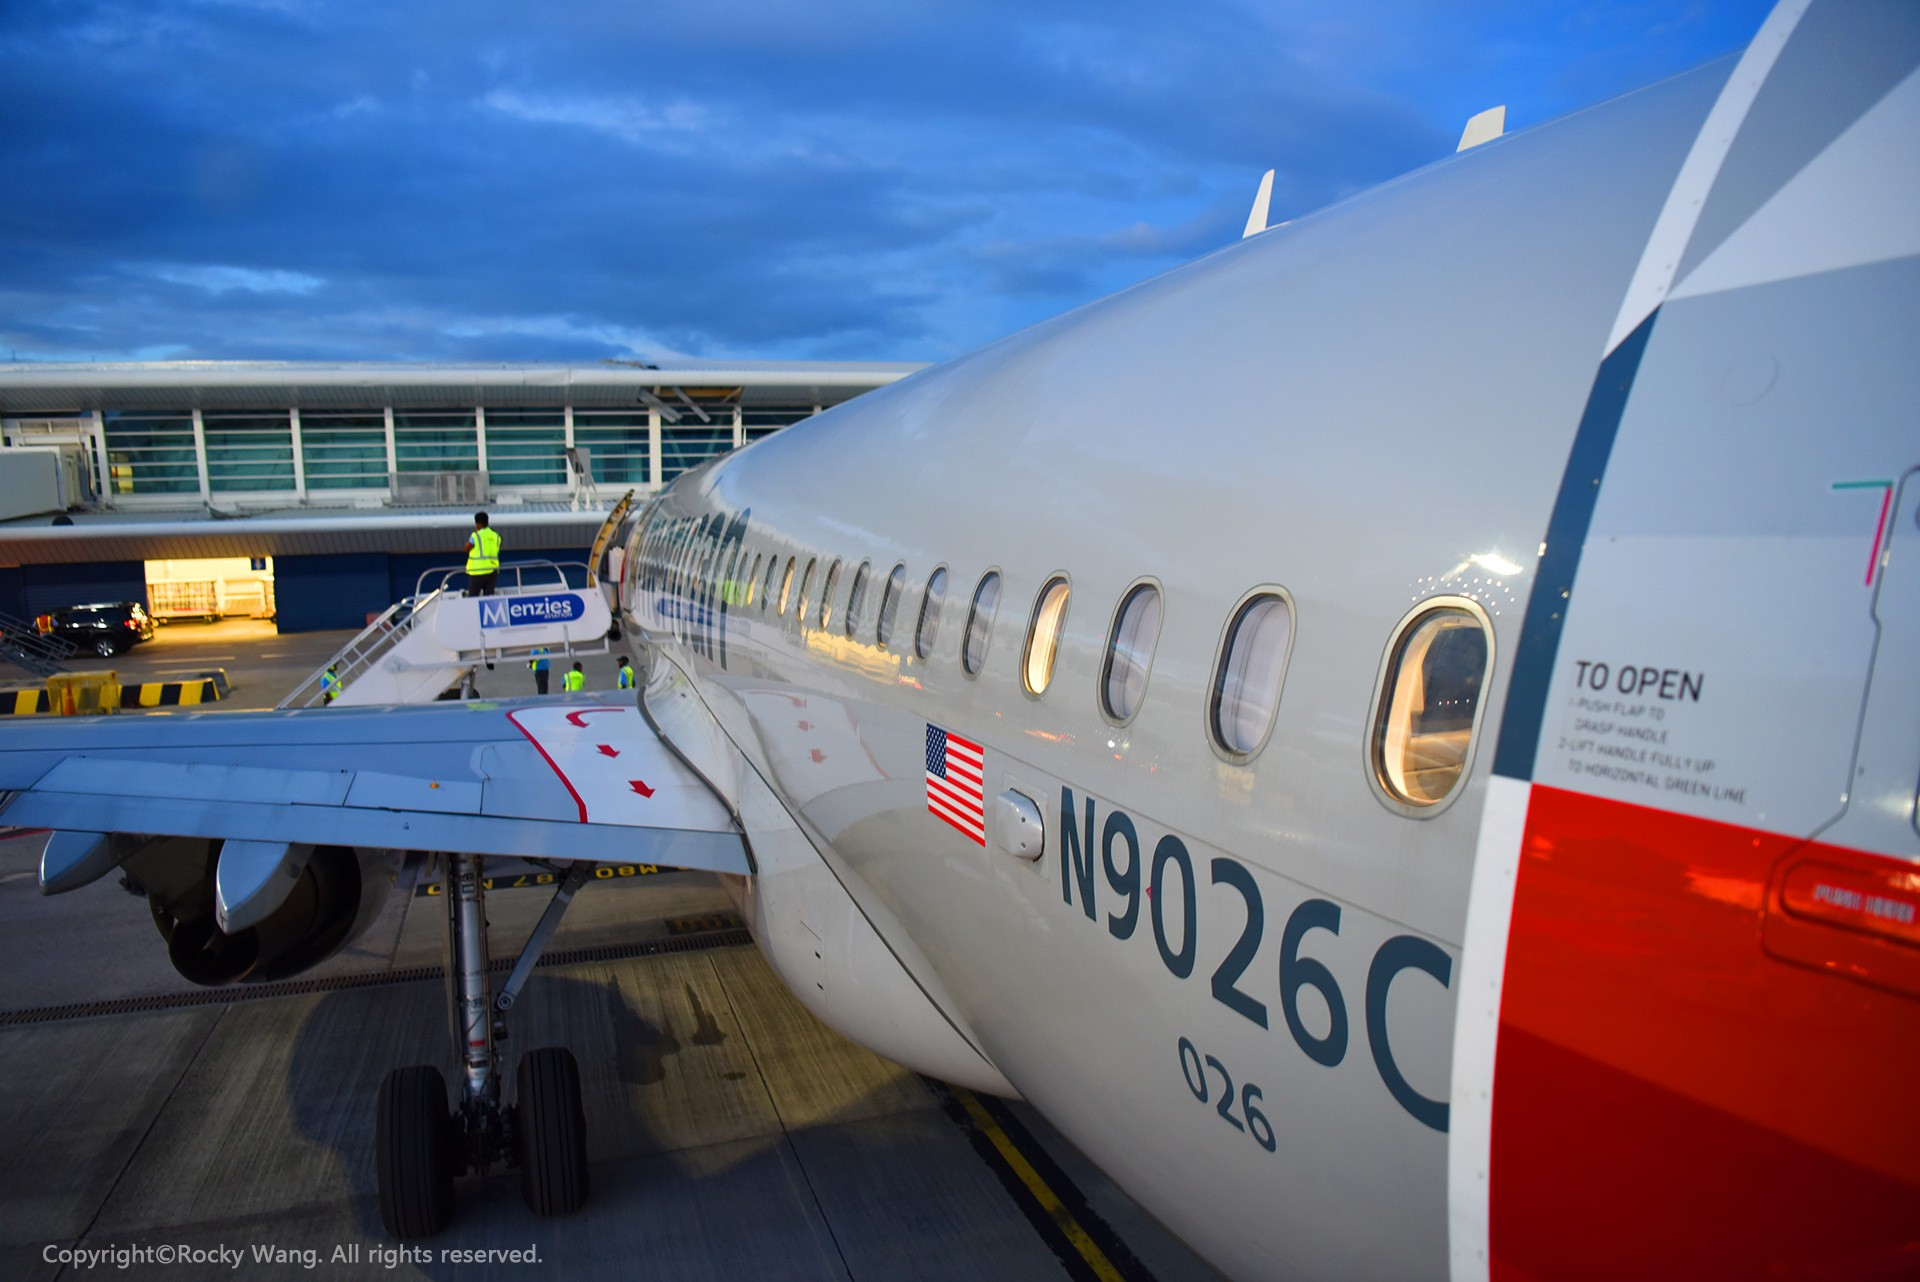 Re:[原创]简易版游记,纪念一次30段的环球飞行和一些碎碎念 AIRBUS A319-115 N9026C Princess Juliana Int'l